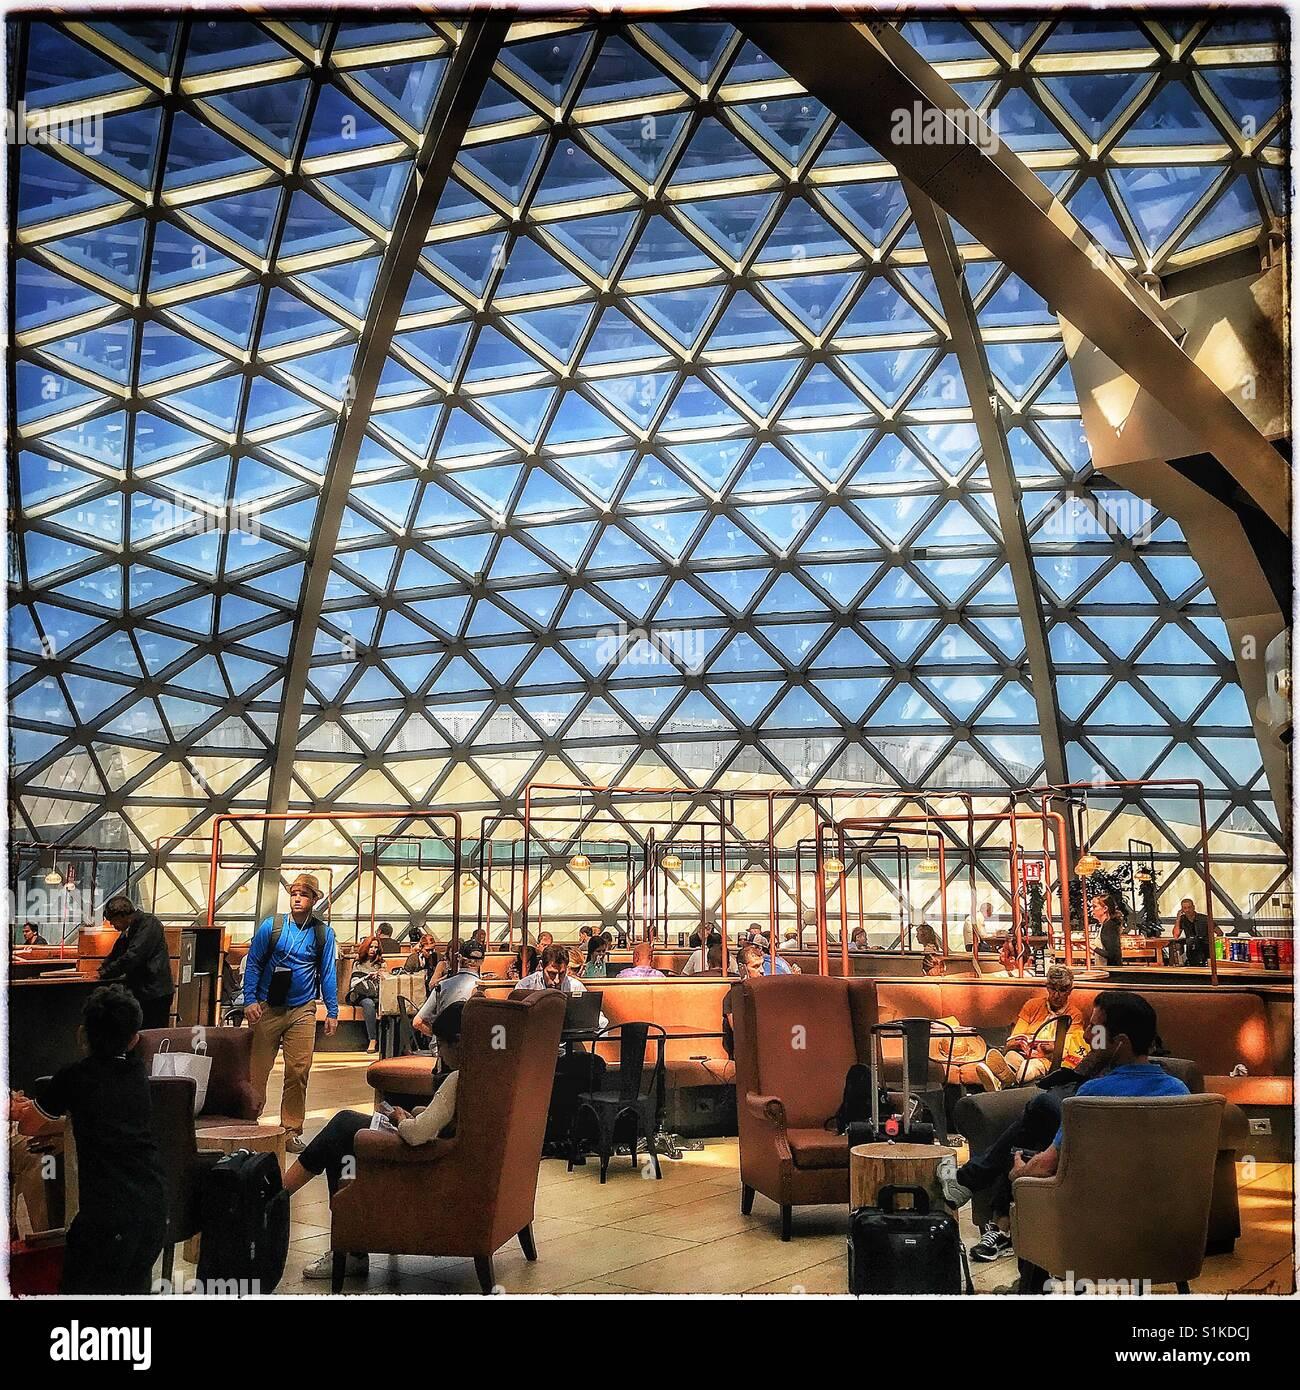 Rome Airport - Stock Image